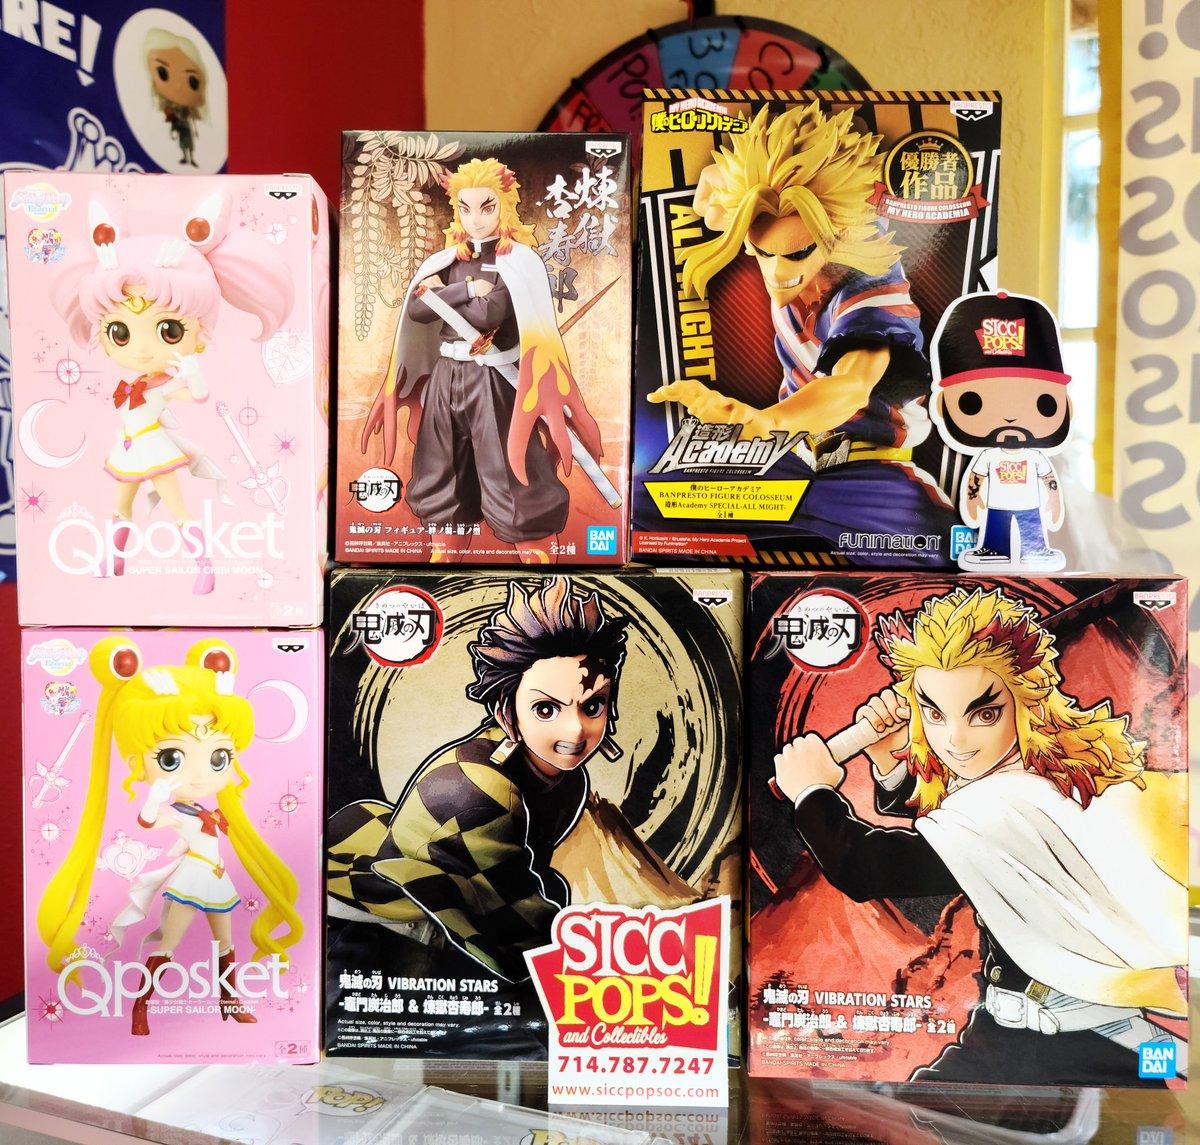 Just In! At #SICCPOPS #Tustin ...... #FunkoCommunity #FunkoFamily #FunkoFunatic #Funko #POP #POPS #Toy #Toys #Statues #Bandai #Banpresto #Anime #DemonSlayer #MyHeroAcademia #SailorMoon